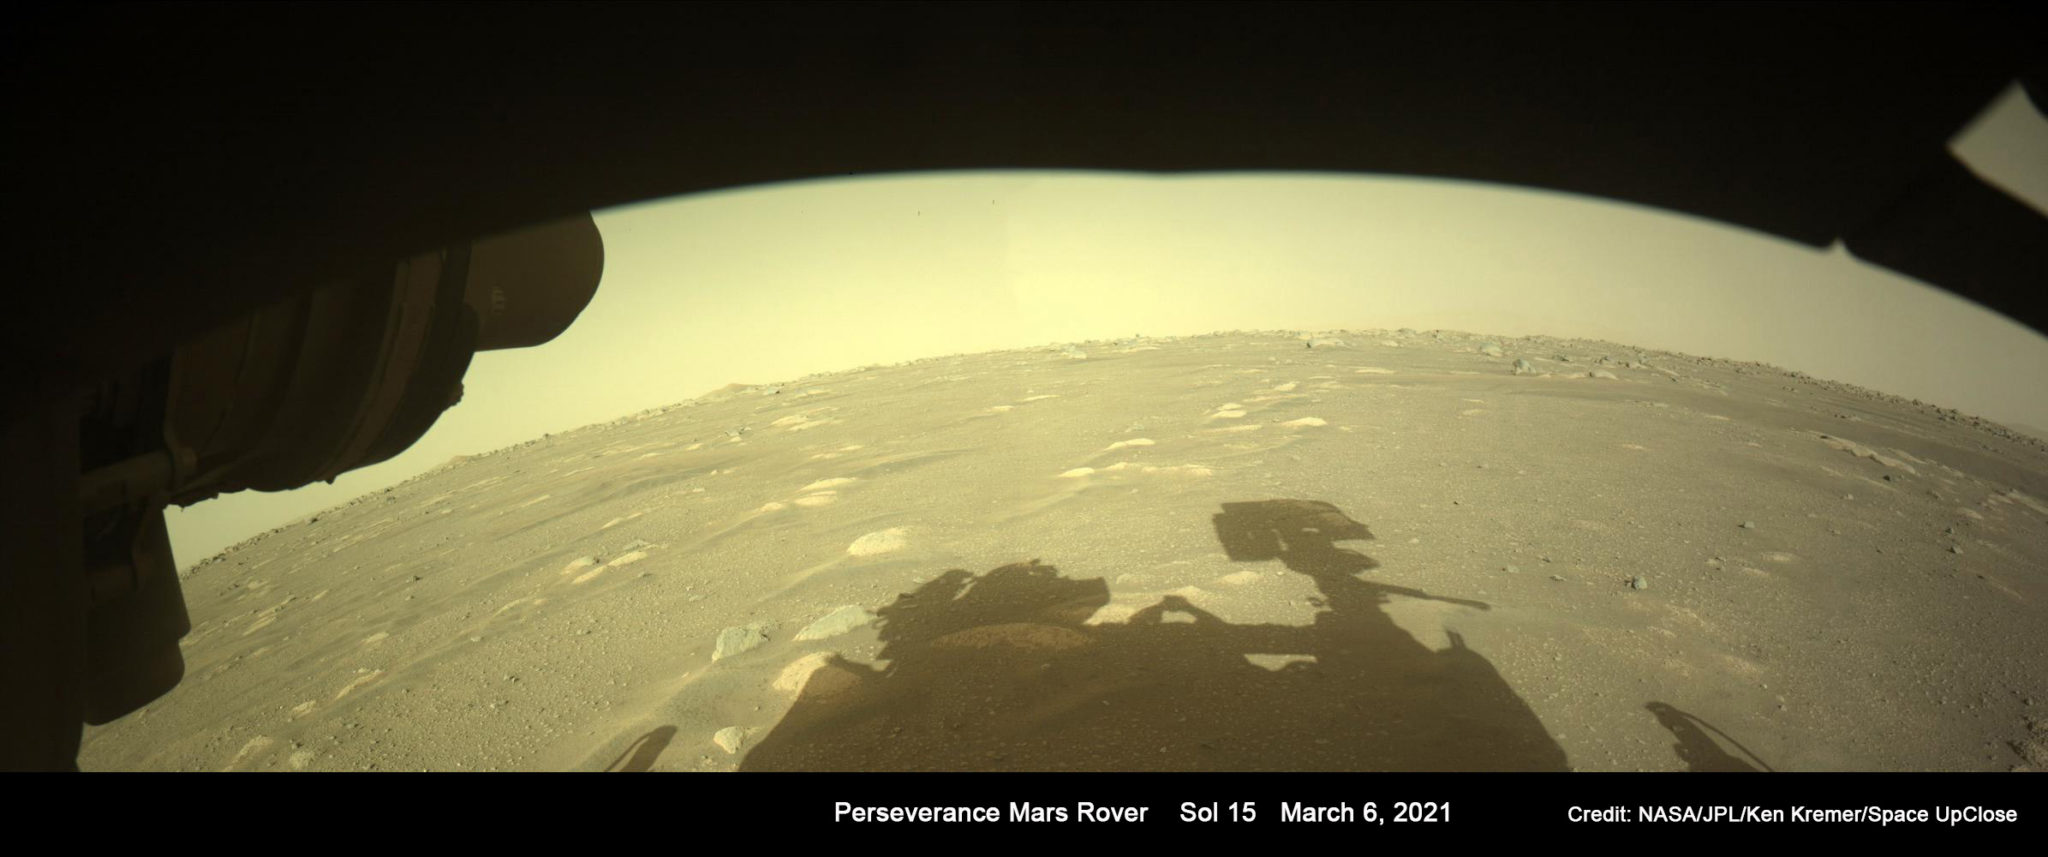 Знаменитые тени марсианских роботов-марсоходов